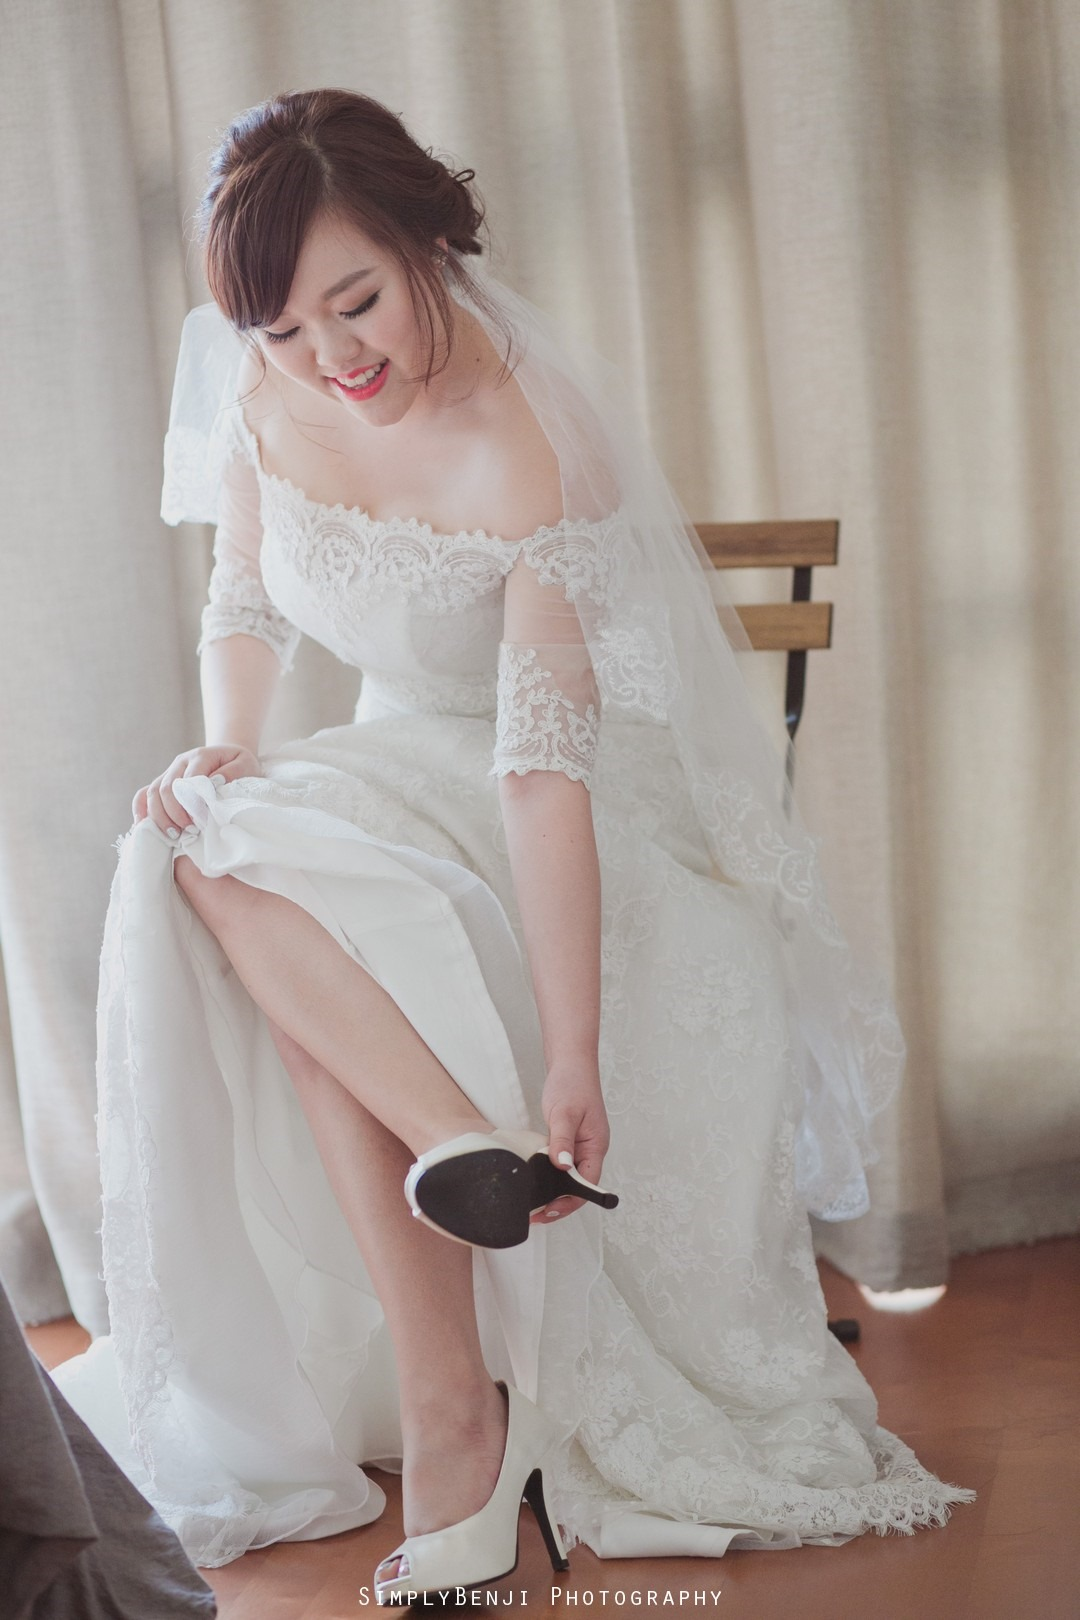 Chinese Wedding Gate Crashing at KM1 East Condominium & Wedding Reception at Concorde Hotel Kuala Lumpur_00007